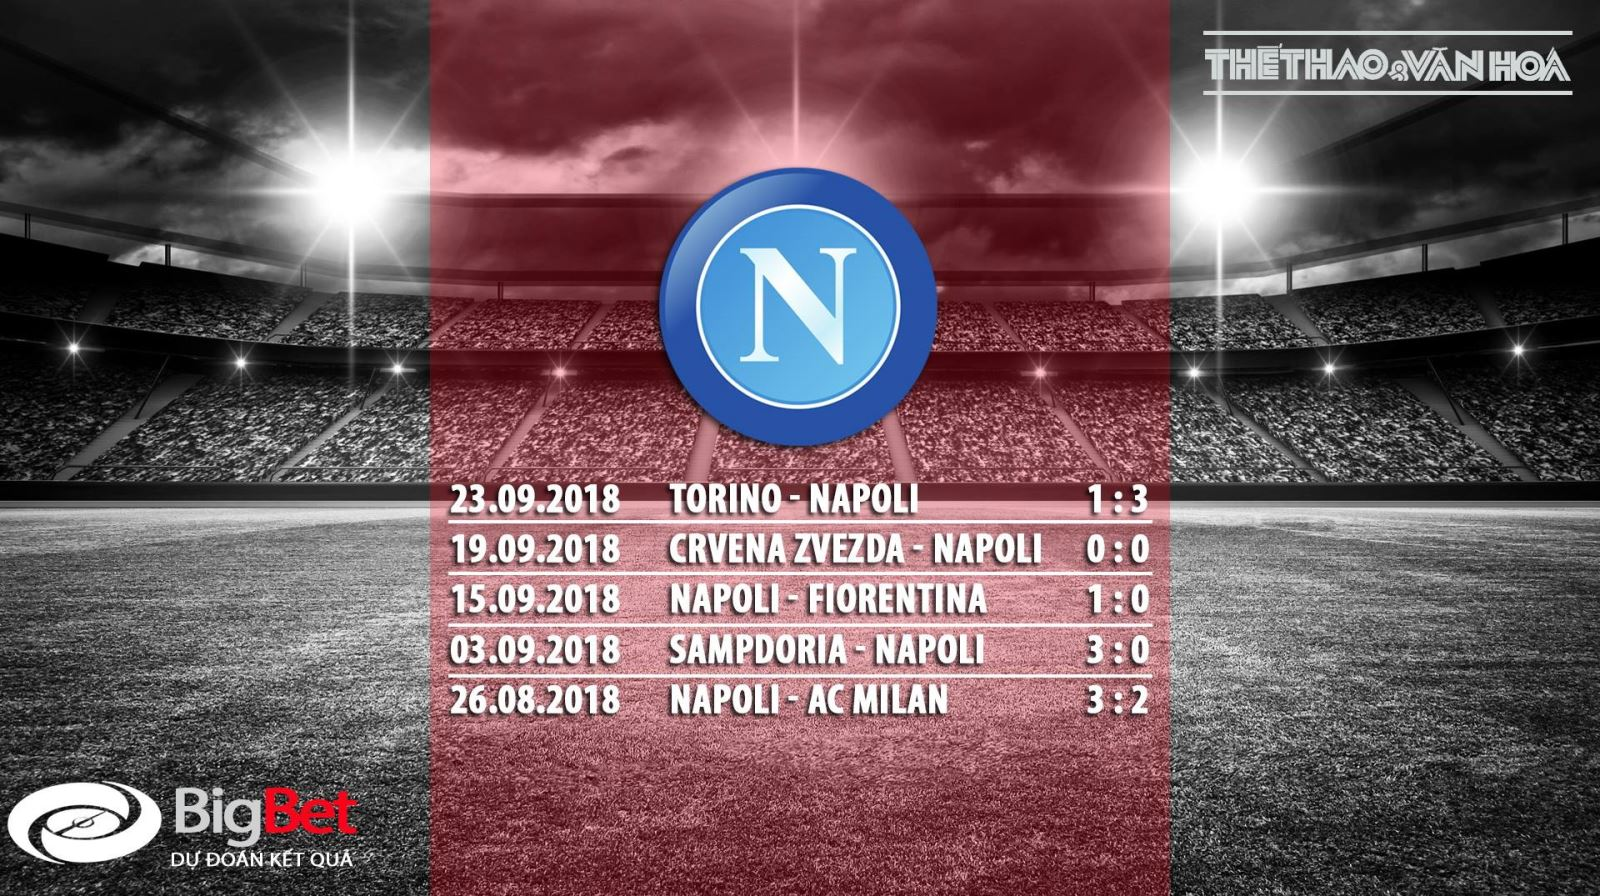 Vòng 7 Serie A: Soi kèo Juventus vs Napoli (0h00 ngày 30/9)